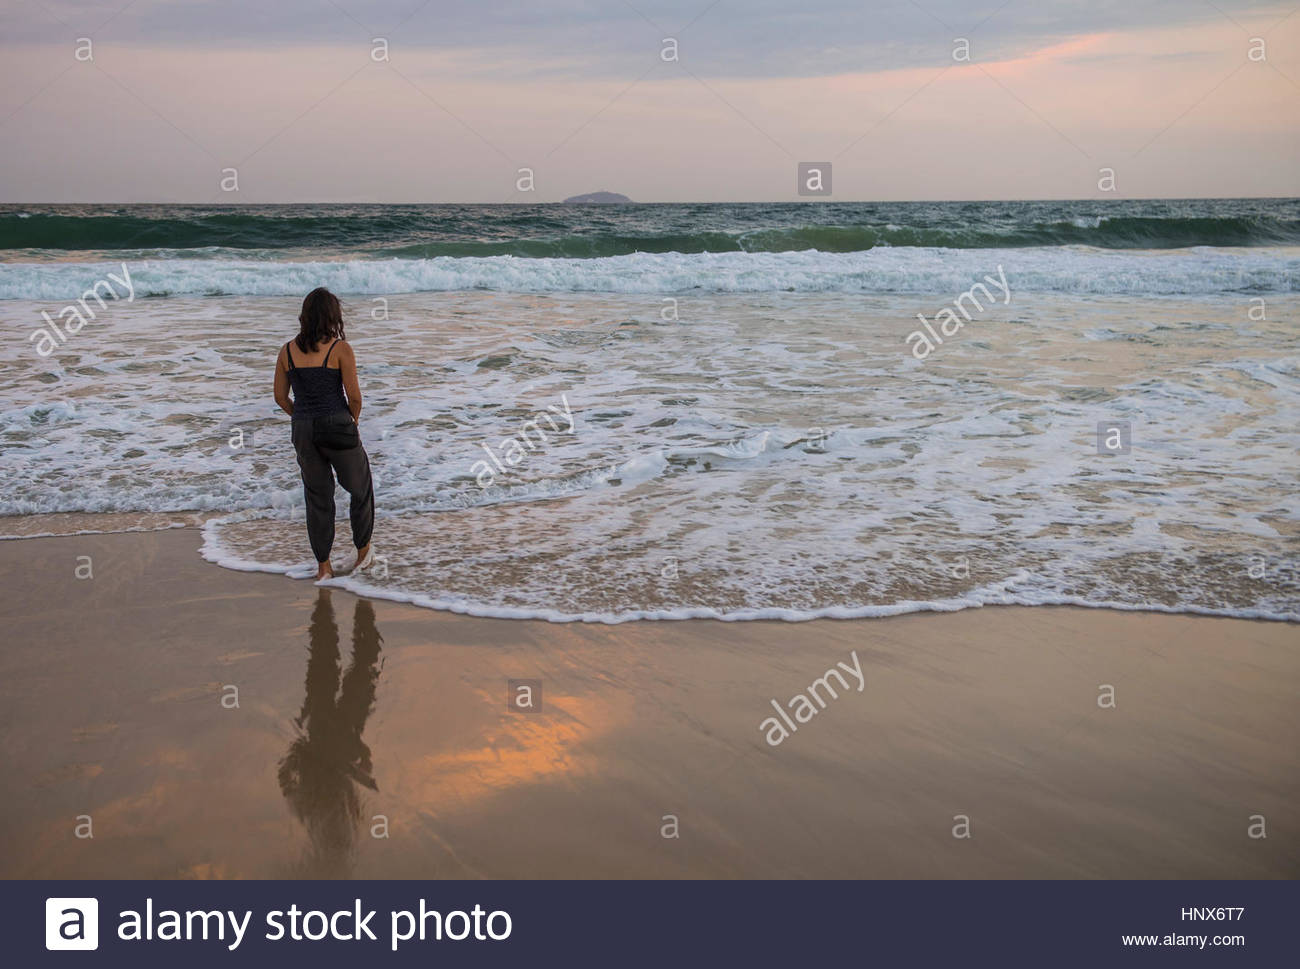 Woman paddling in lapping waves, Copacabana, Rio de Janeiro, Brazil - Stock Image